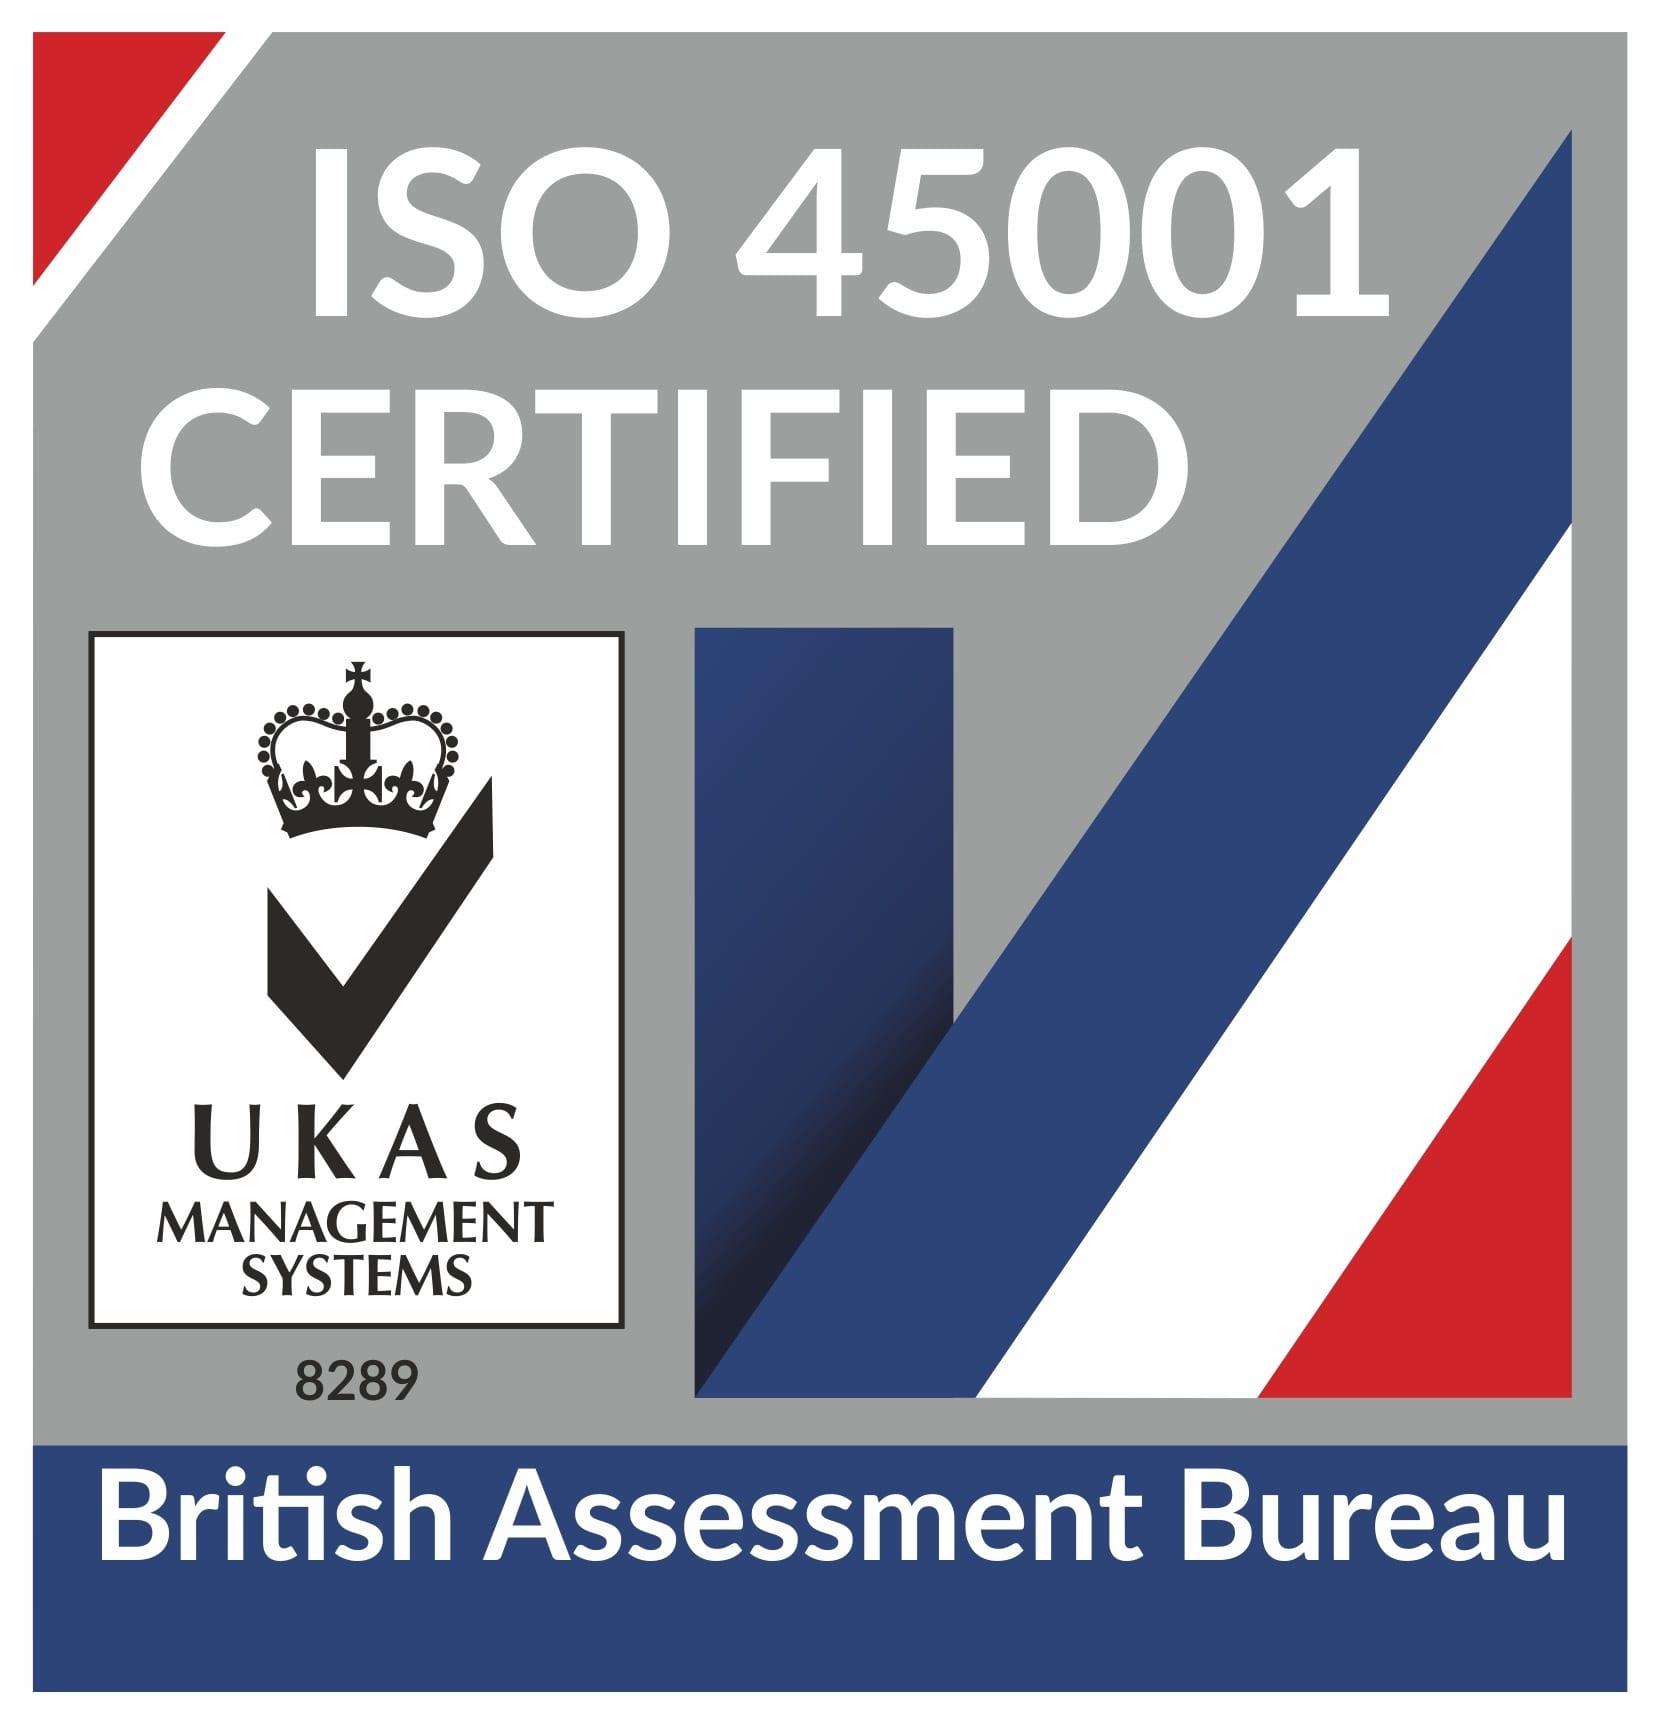 ISO-45001-UKAS-1